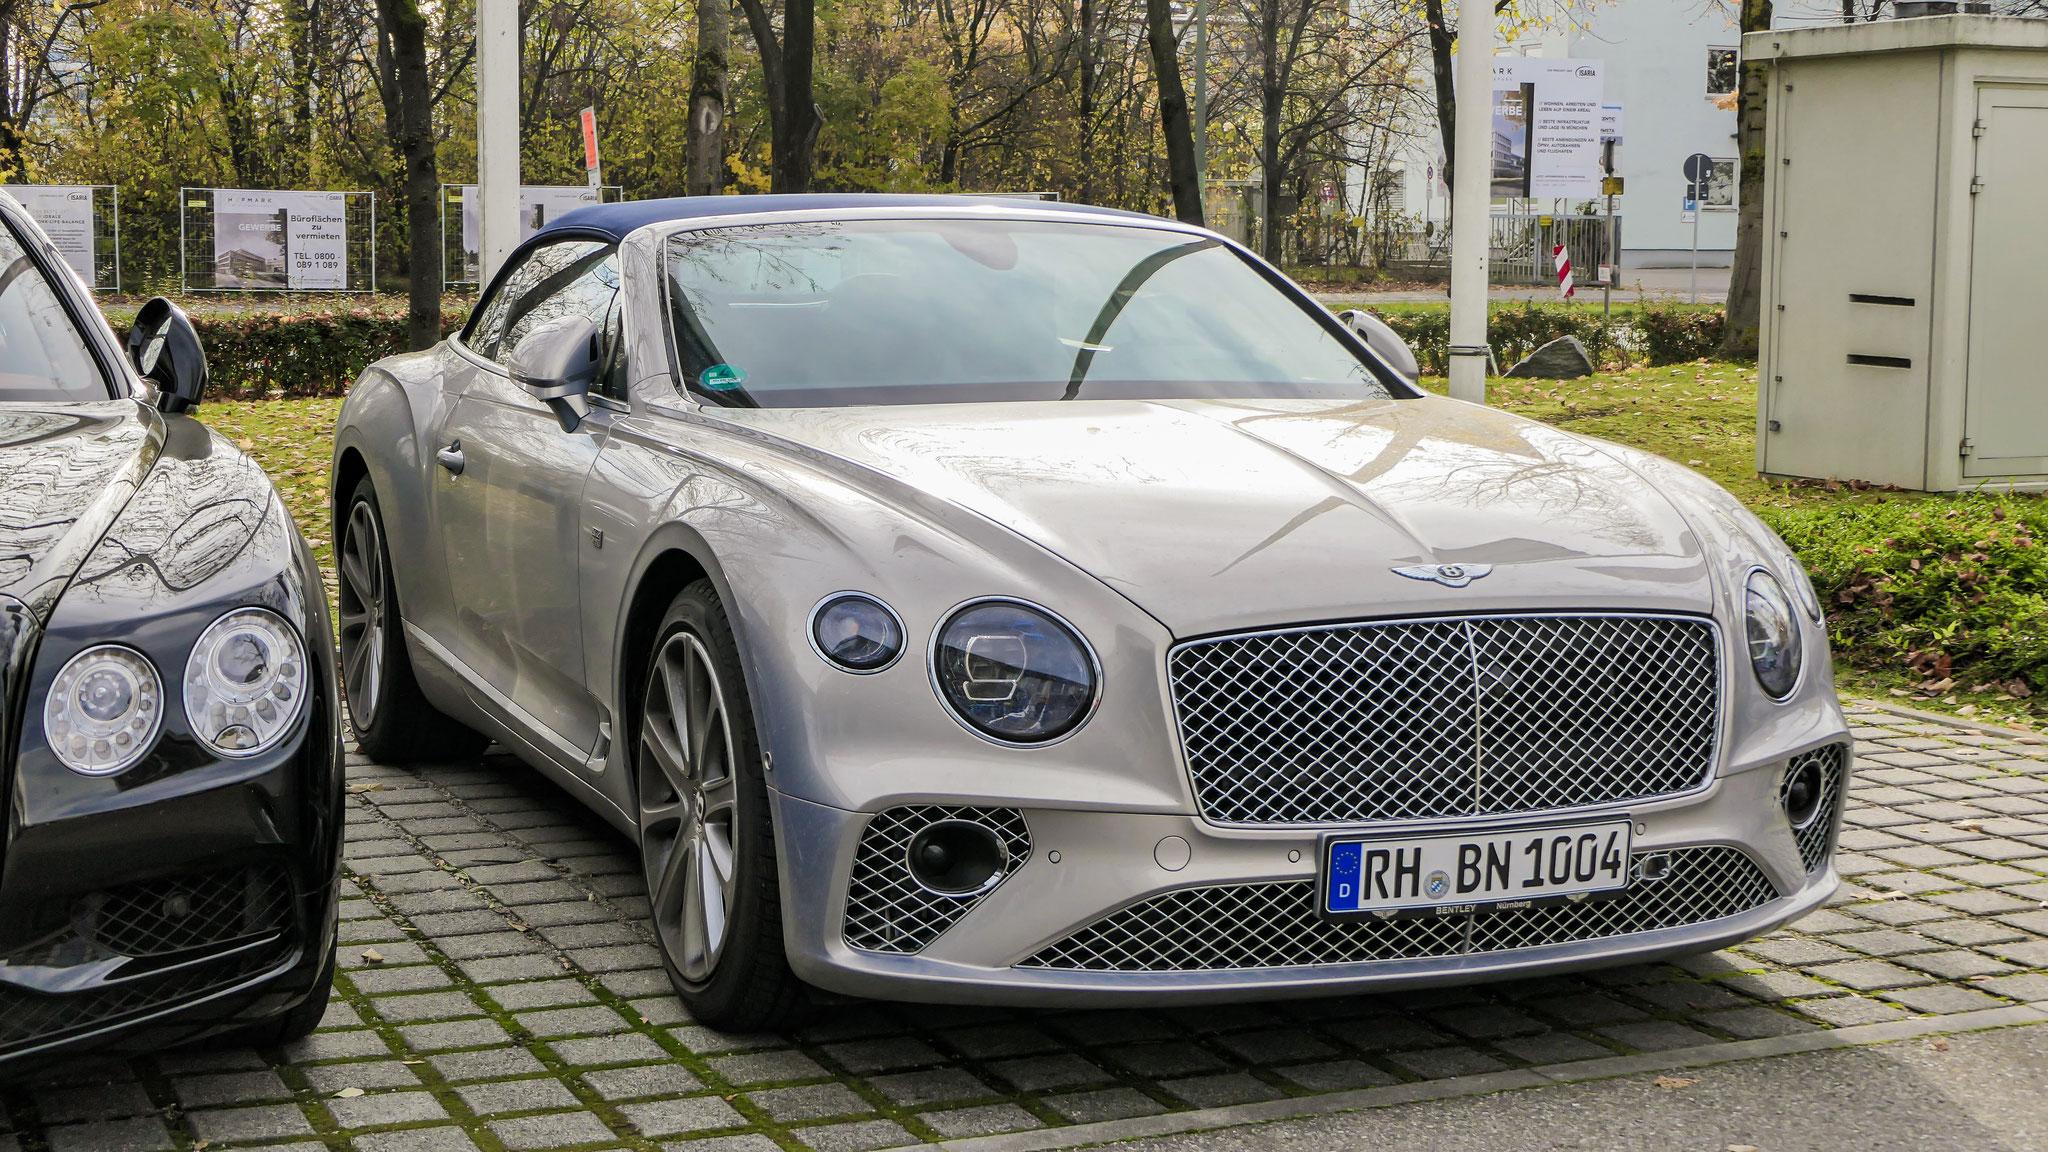 Bentley Continental GTC - RH-BN-1004